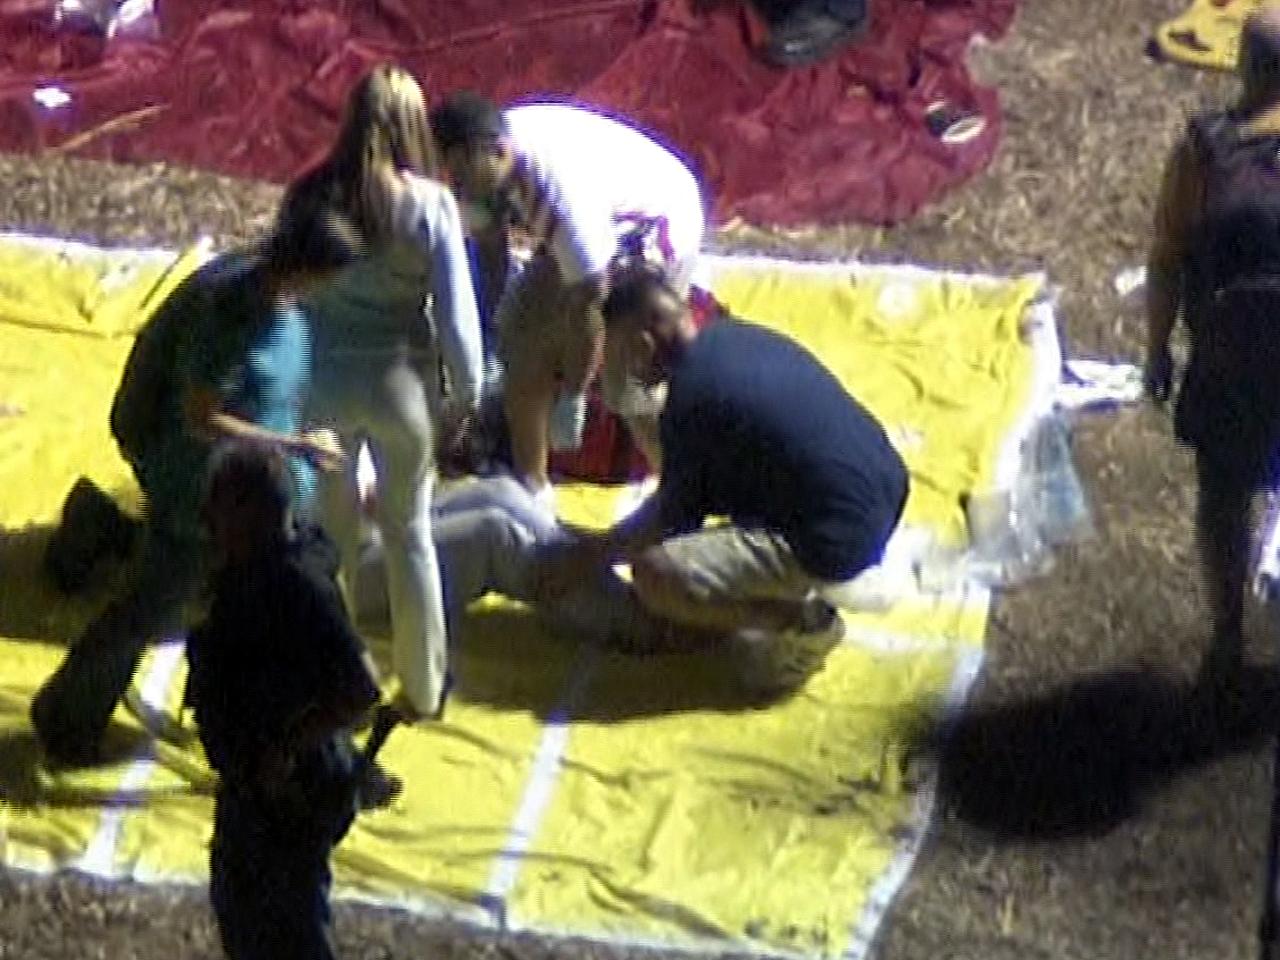 28 injured as fireworks detonate into crowd